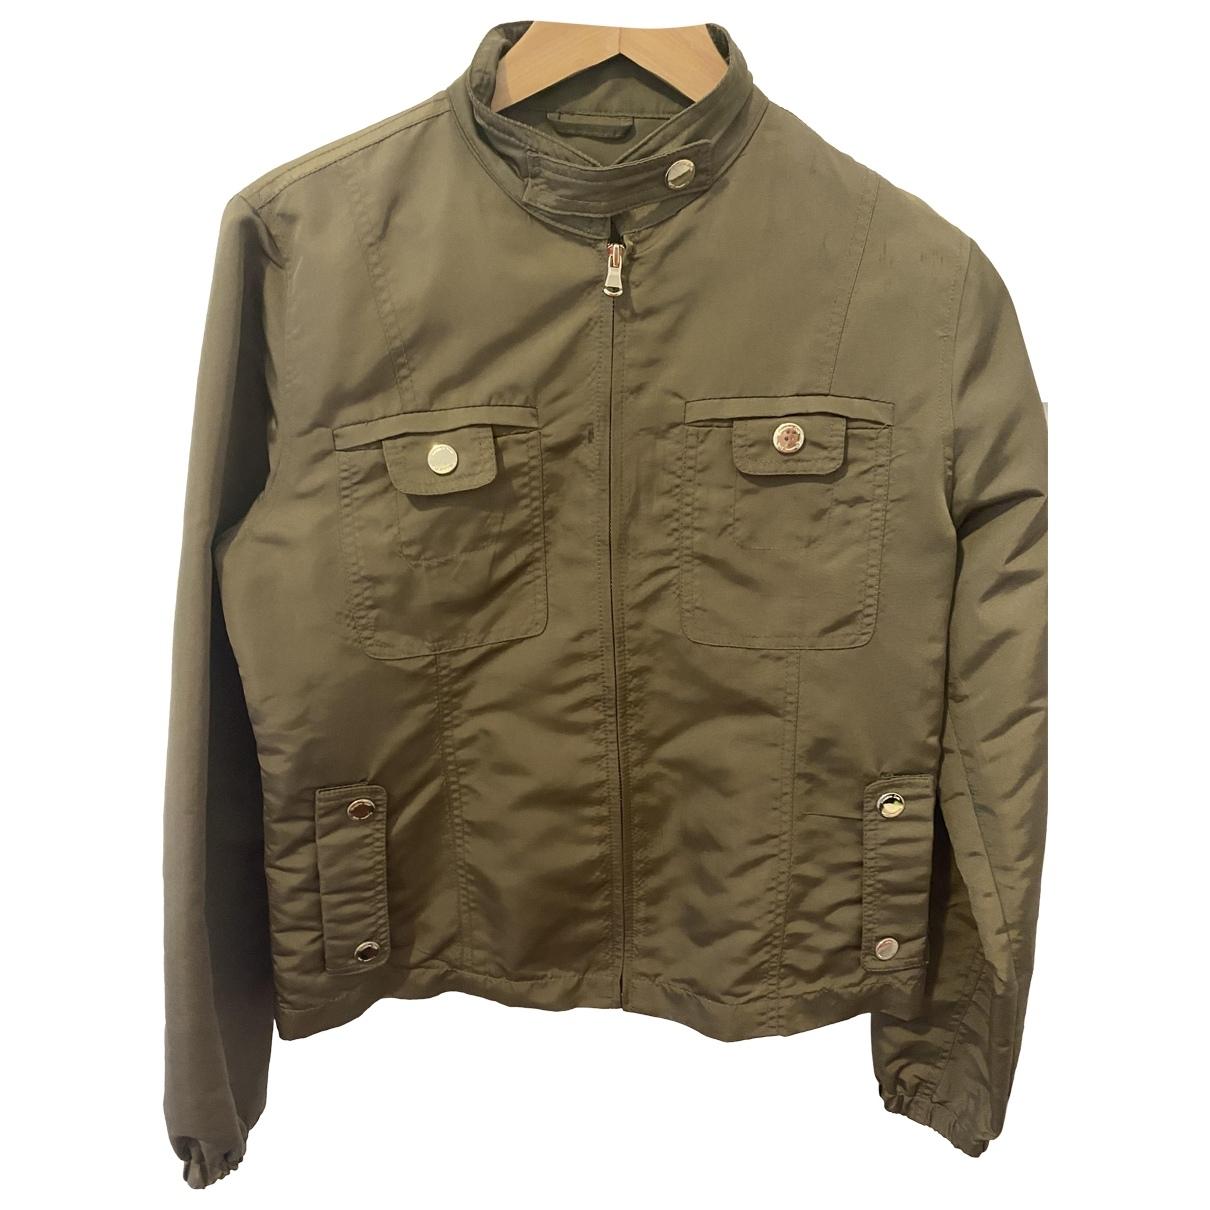 Massimo Dutti \N Khaki jacket for Women L International